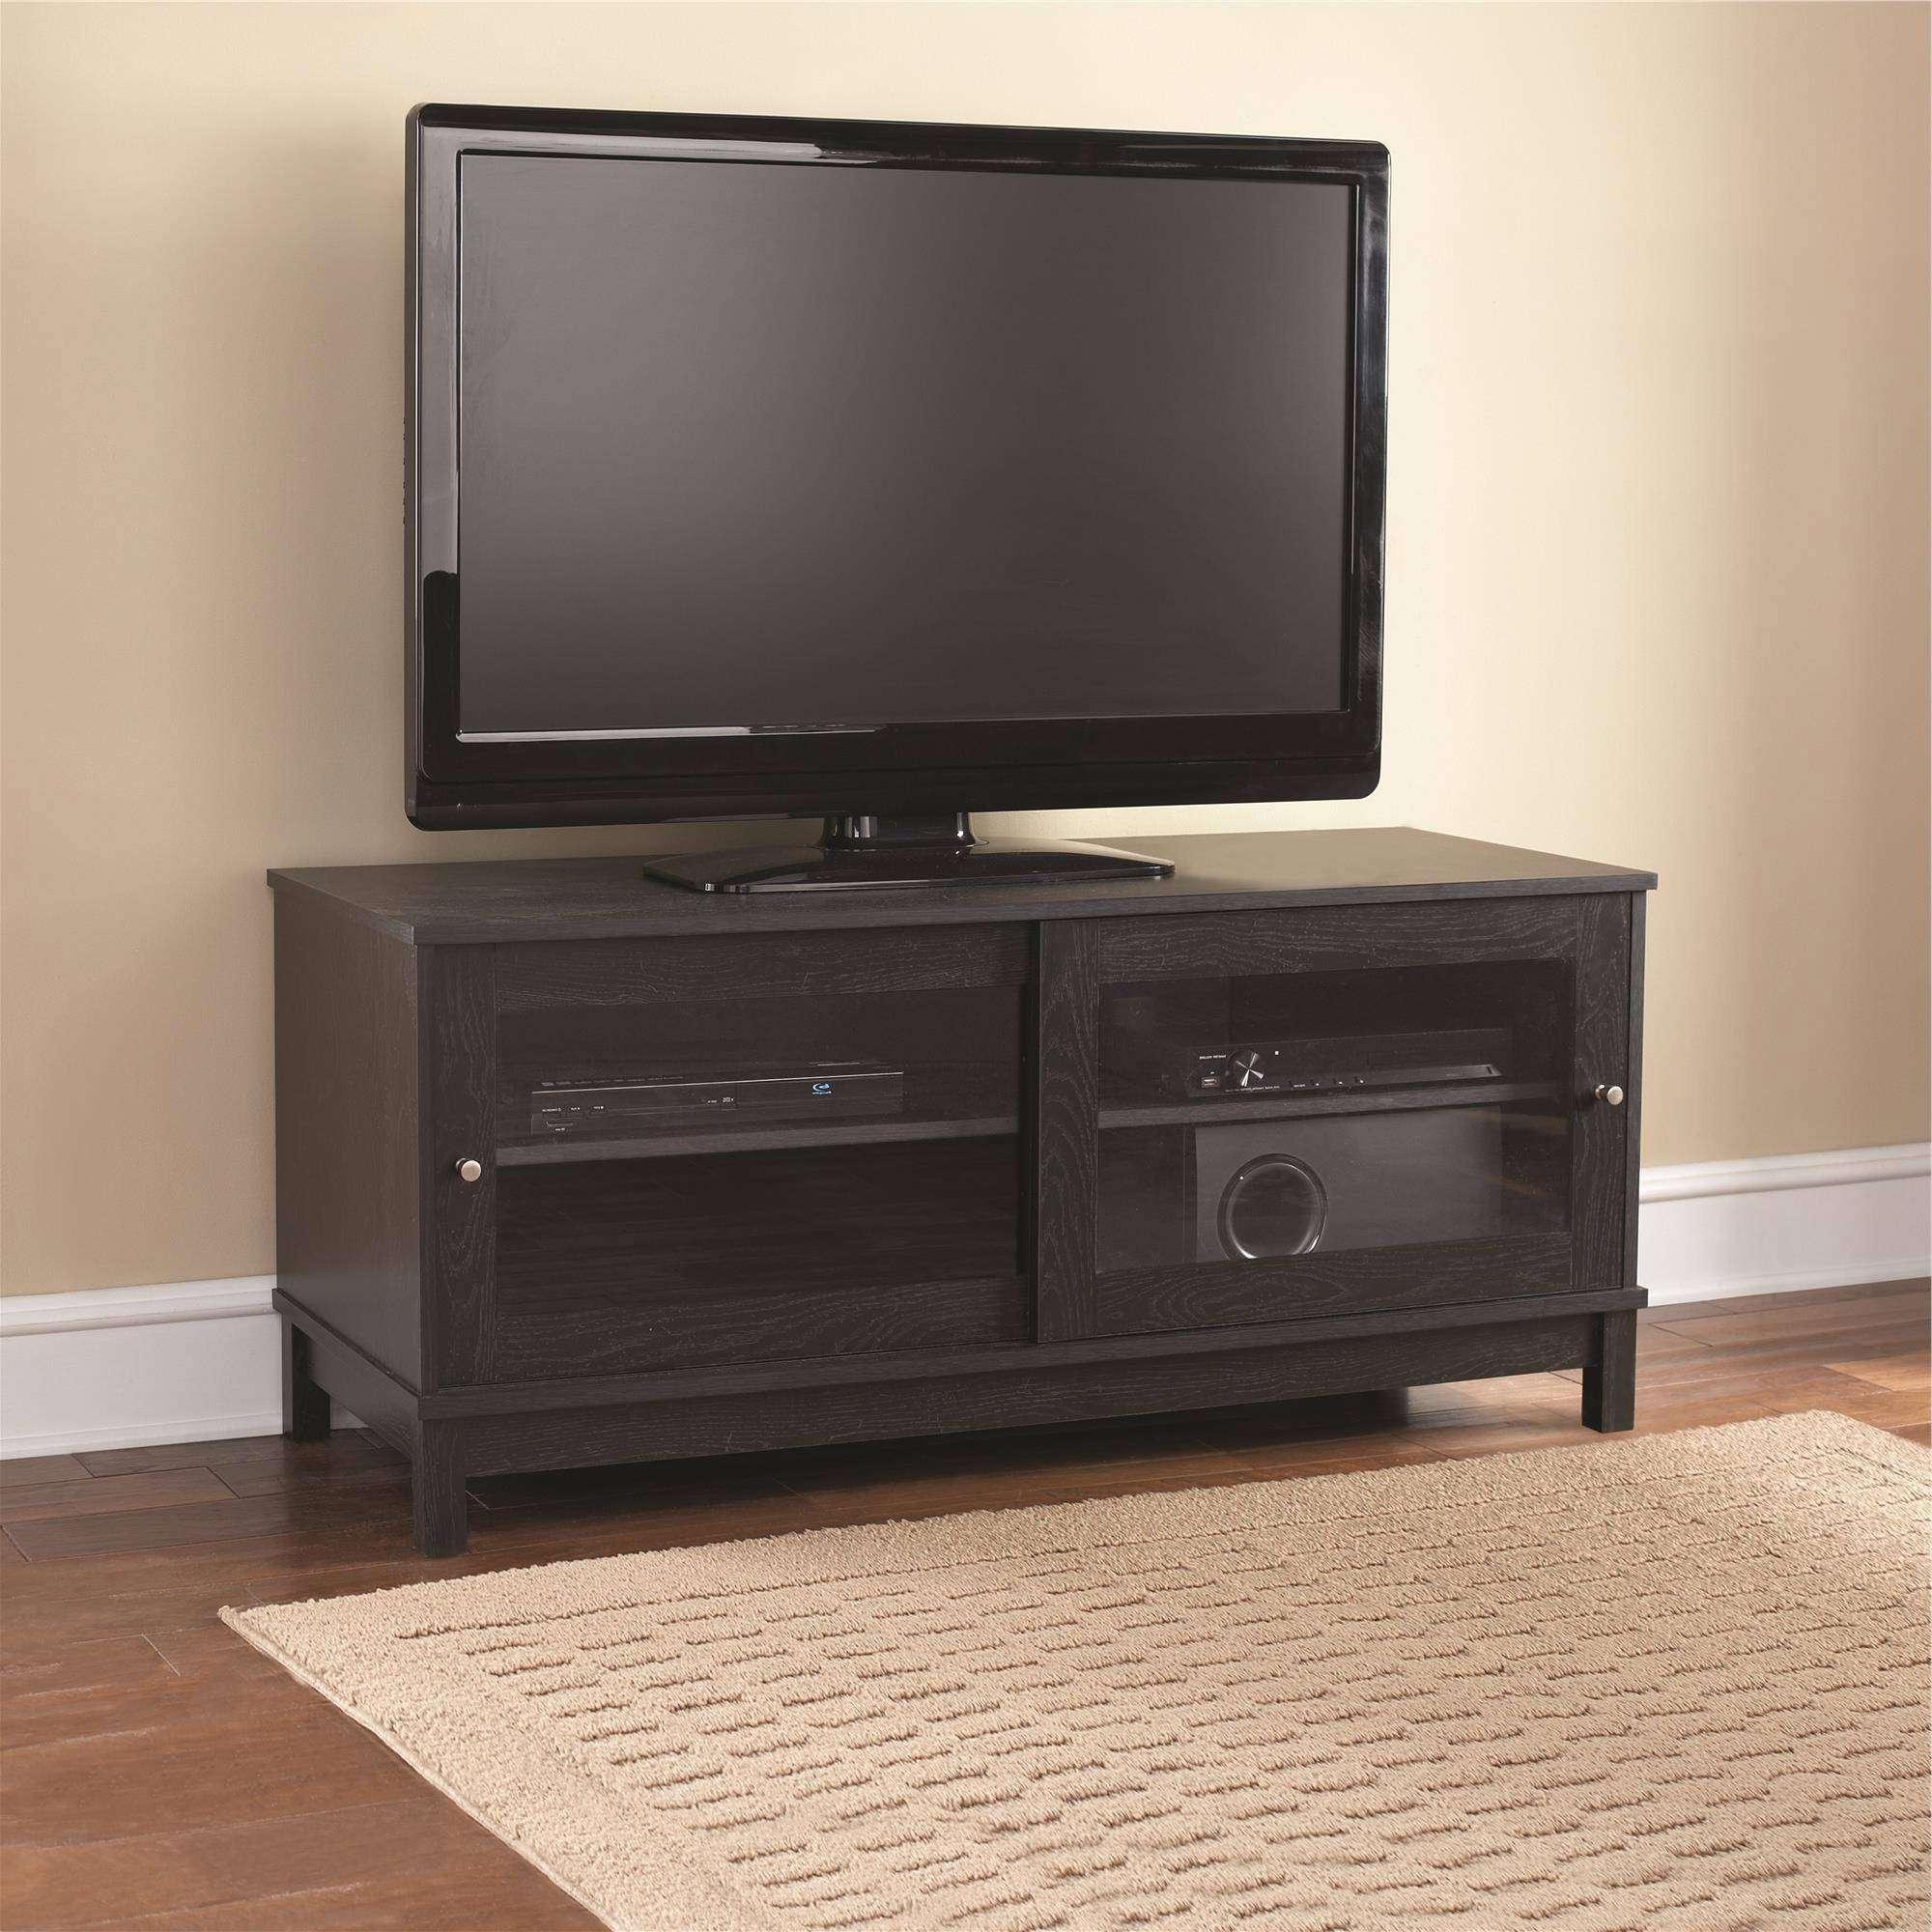 Tv : Beautiful Light Oak Tv Stands Flat Screen Mainstays Tv Stand With Regard To Light Oak Tv Stands Flat Screen (View 5 of 15)